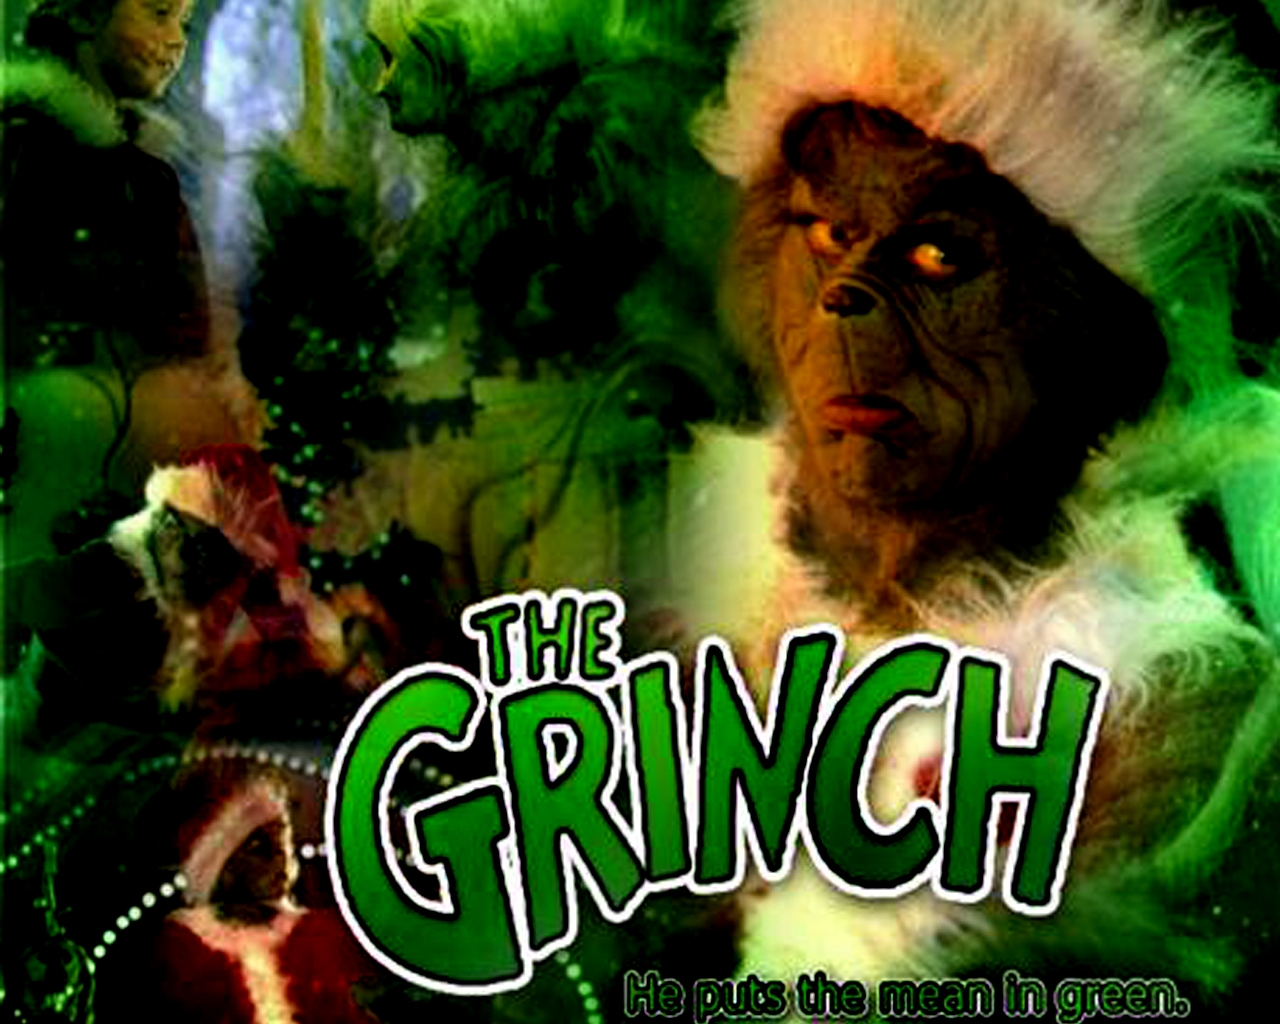 Jim Carey as The Grinch Christmas Wallpaper